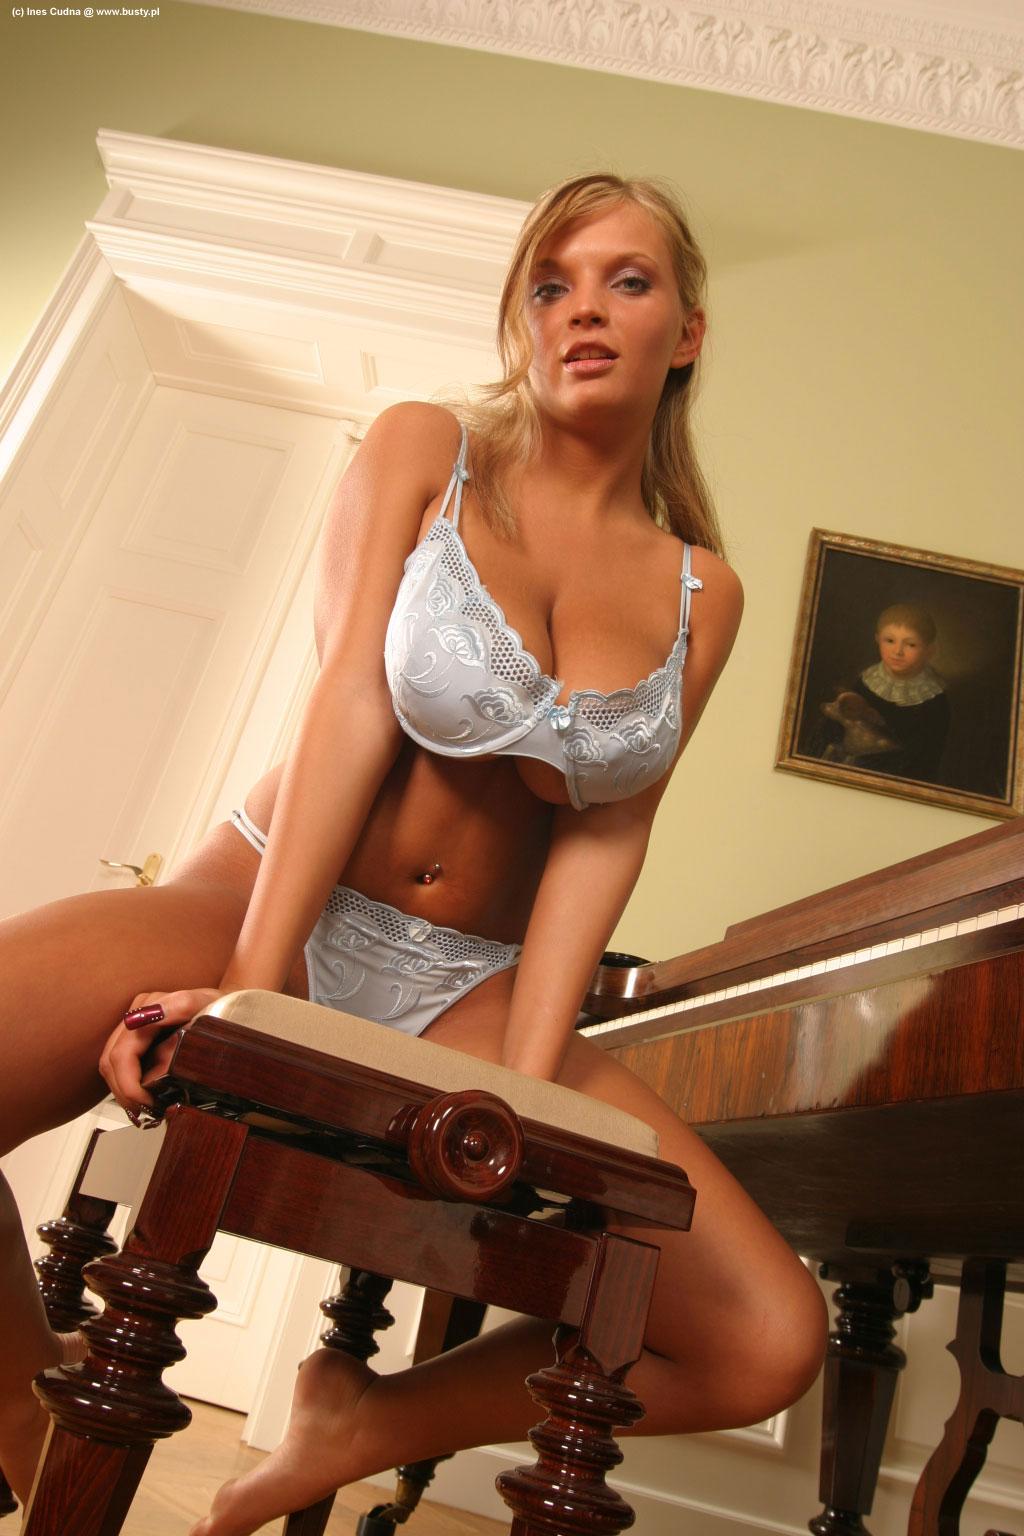 Ines Cudna plays piano